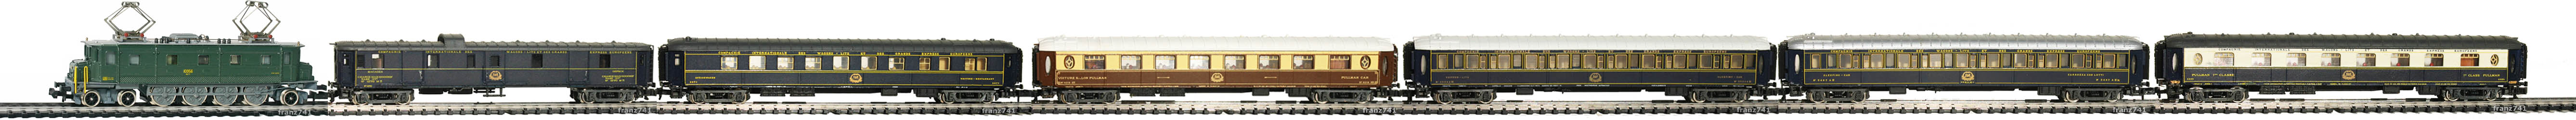 Epoche-II-III-CIWL-Simplon-Orientexpress_Ae-4-7-Elok-Pullman-Wagen